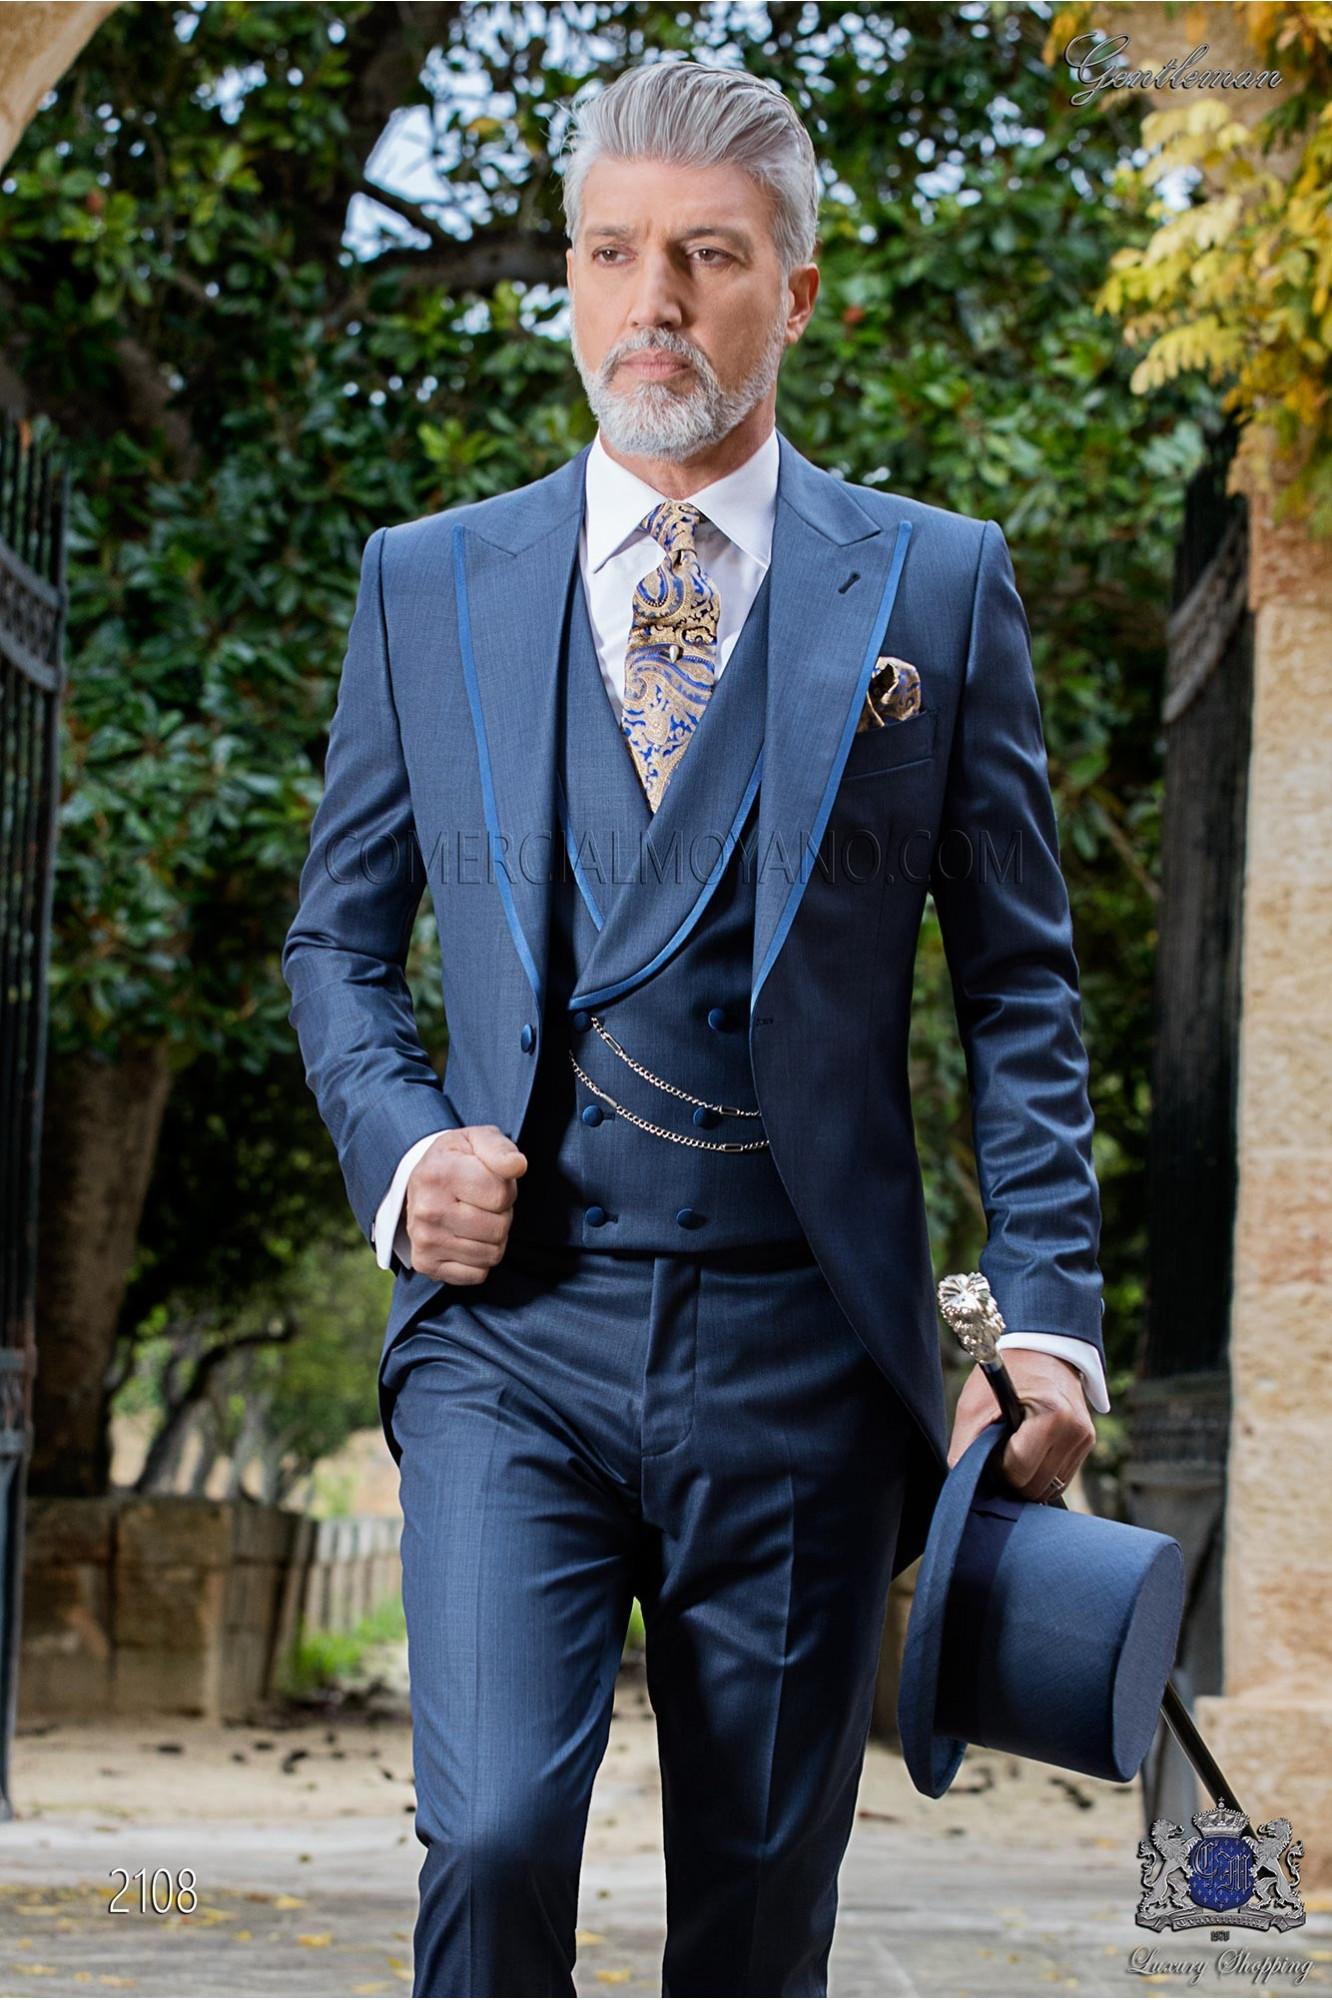 Elegant Italian morning suit